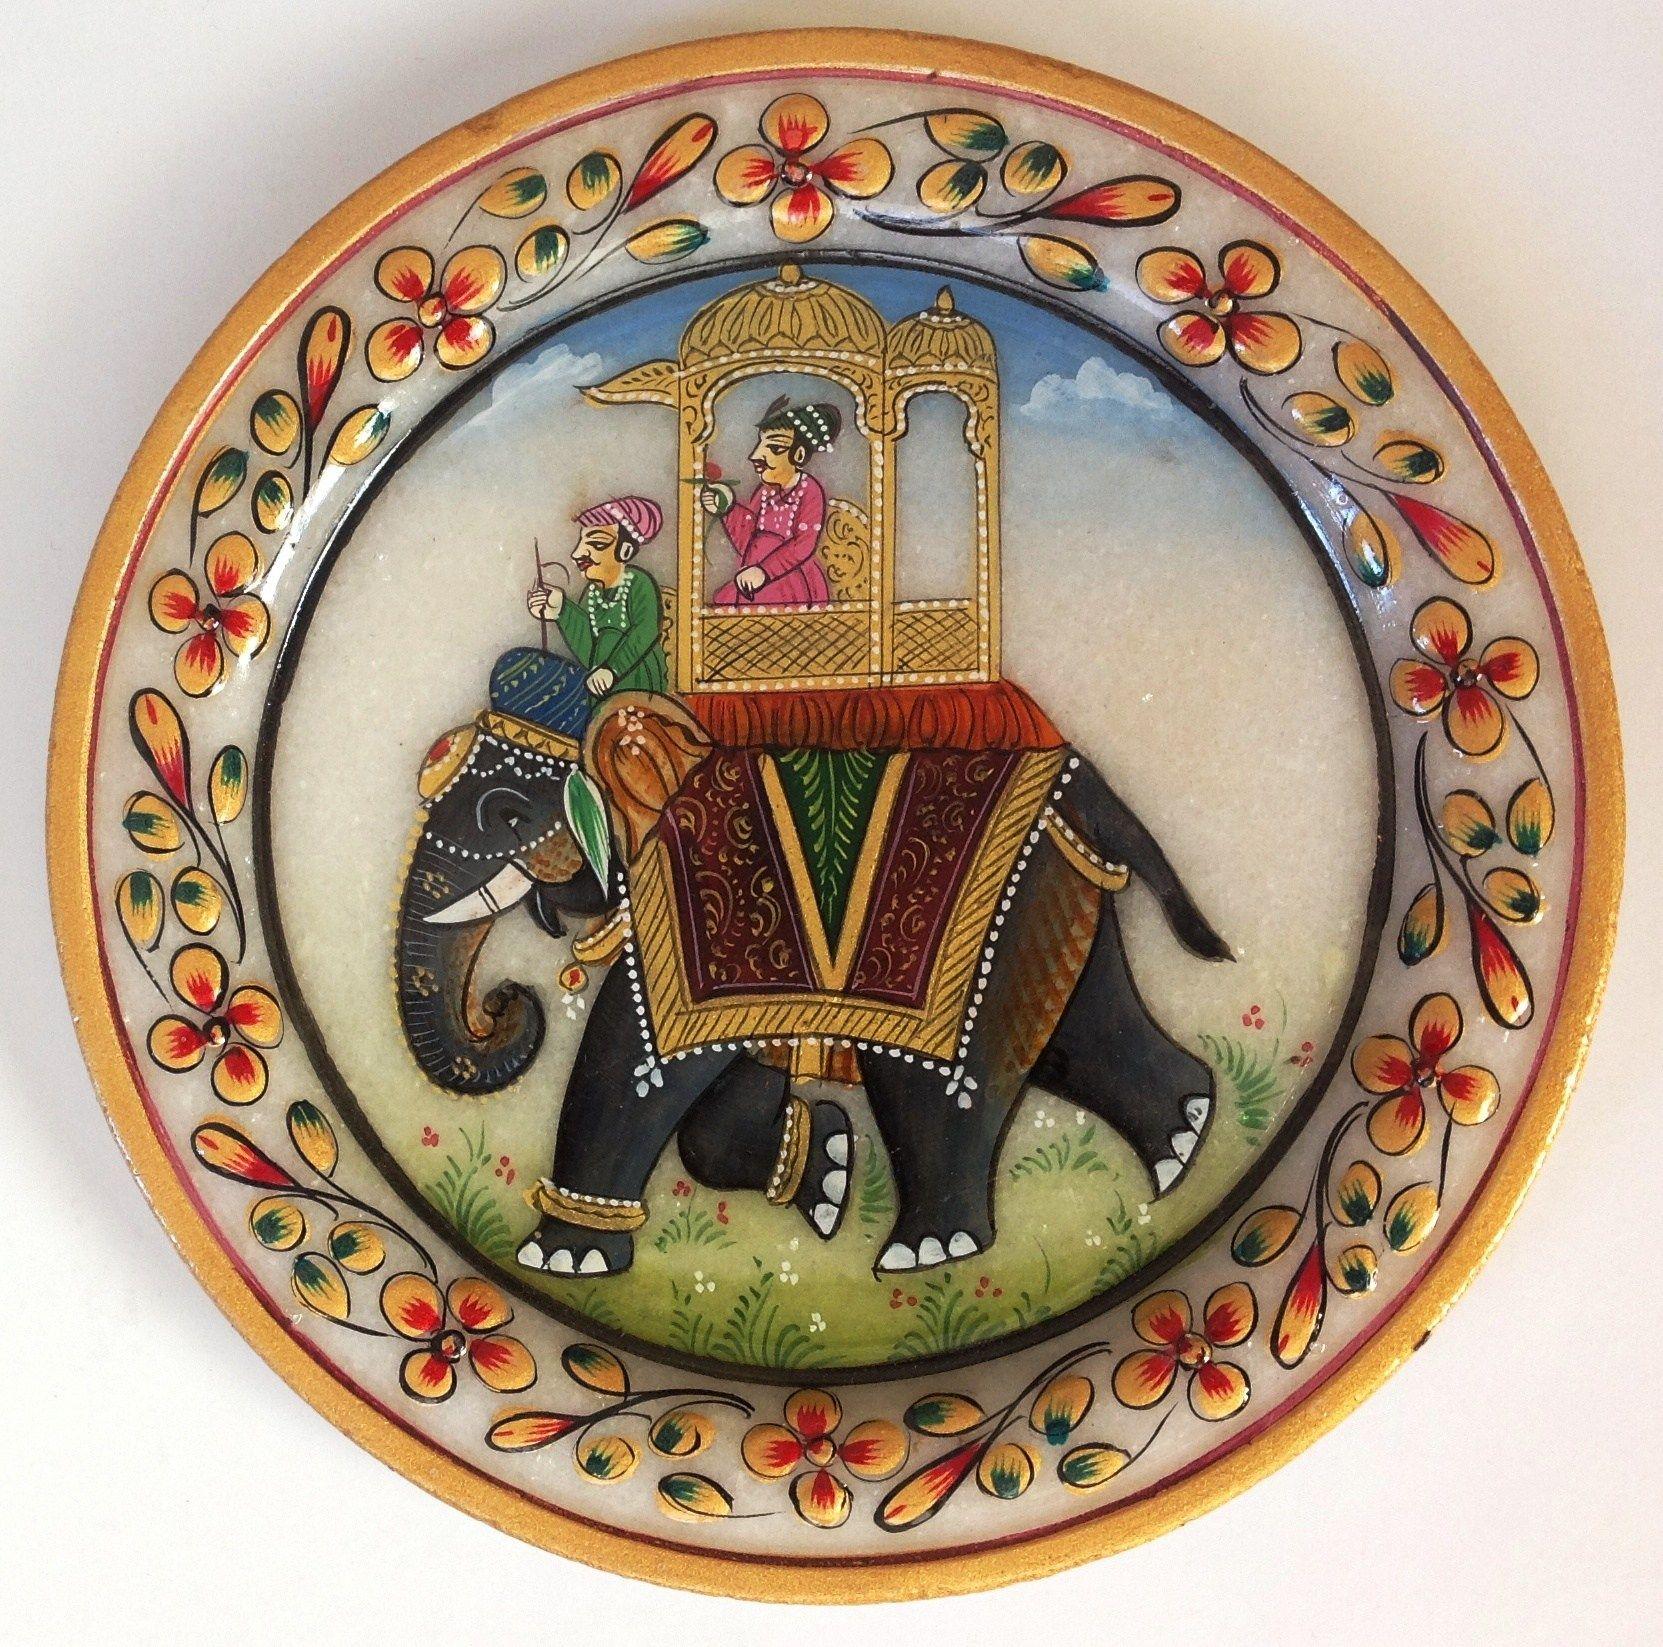 Indian Maharaja 5 Marble Plate Art Handmade Floral